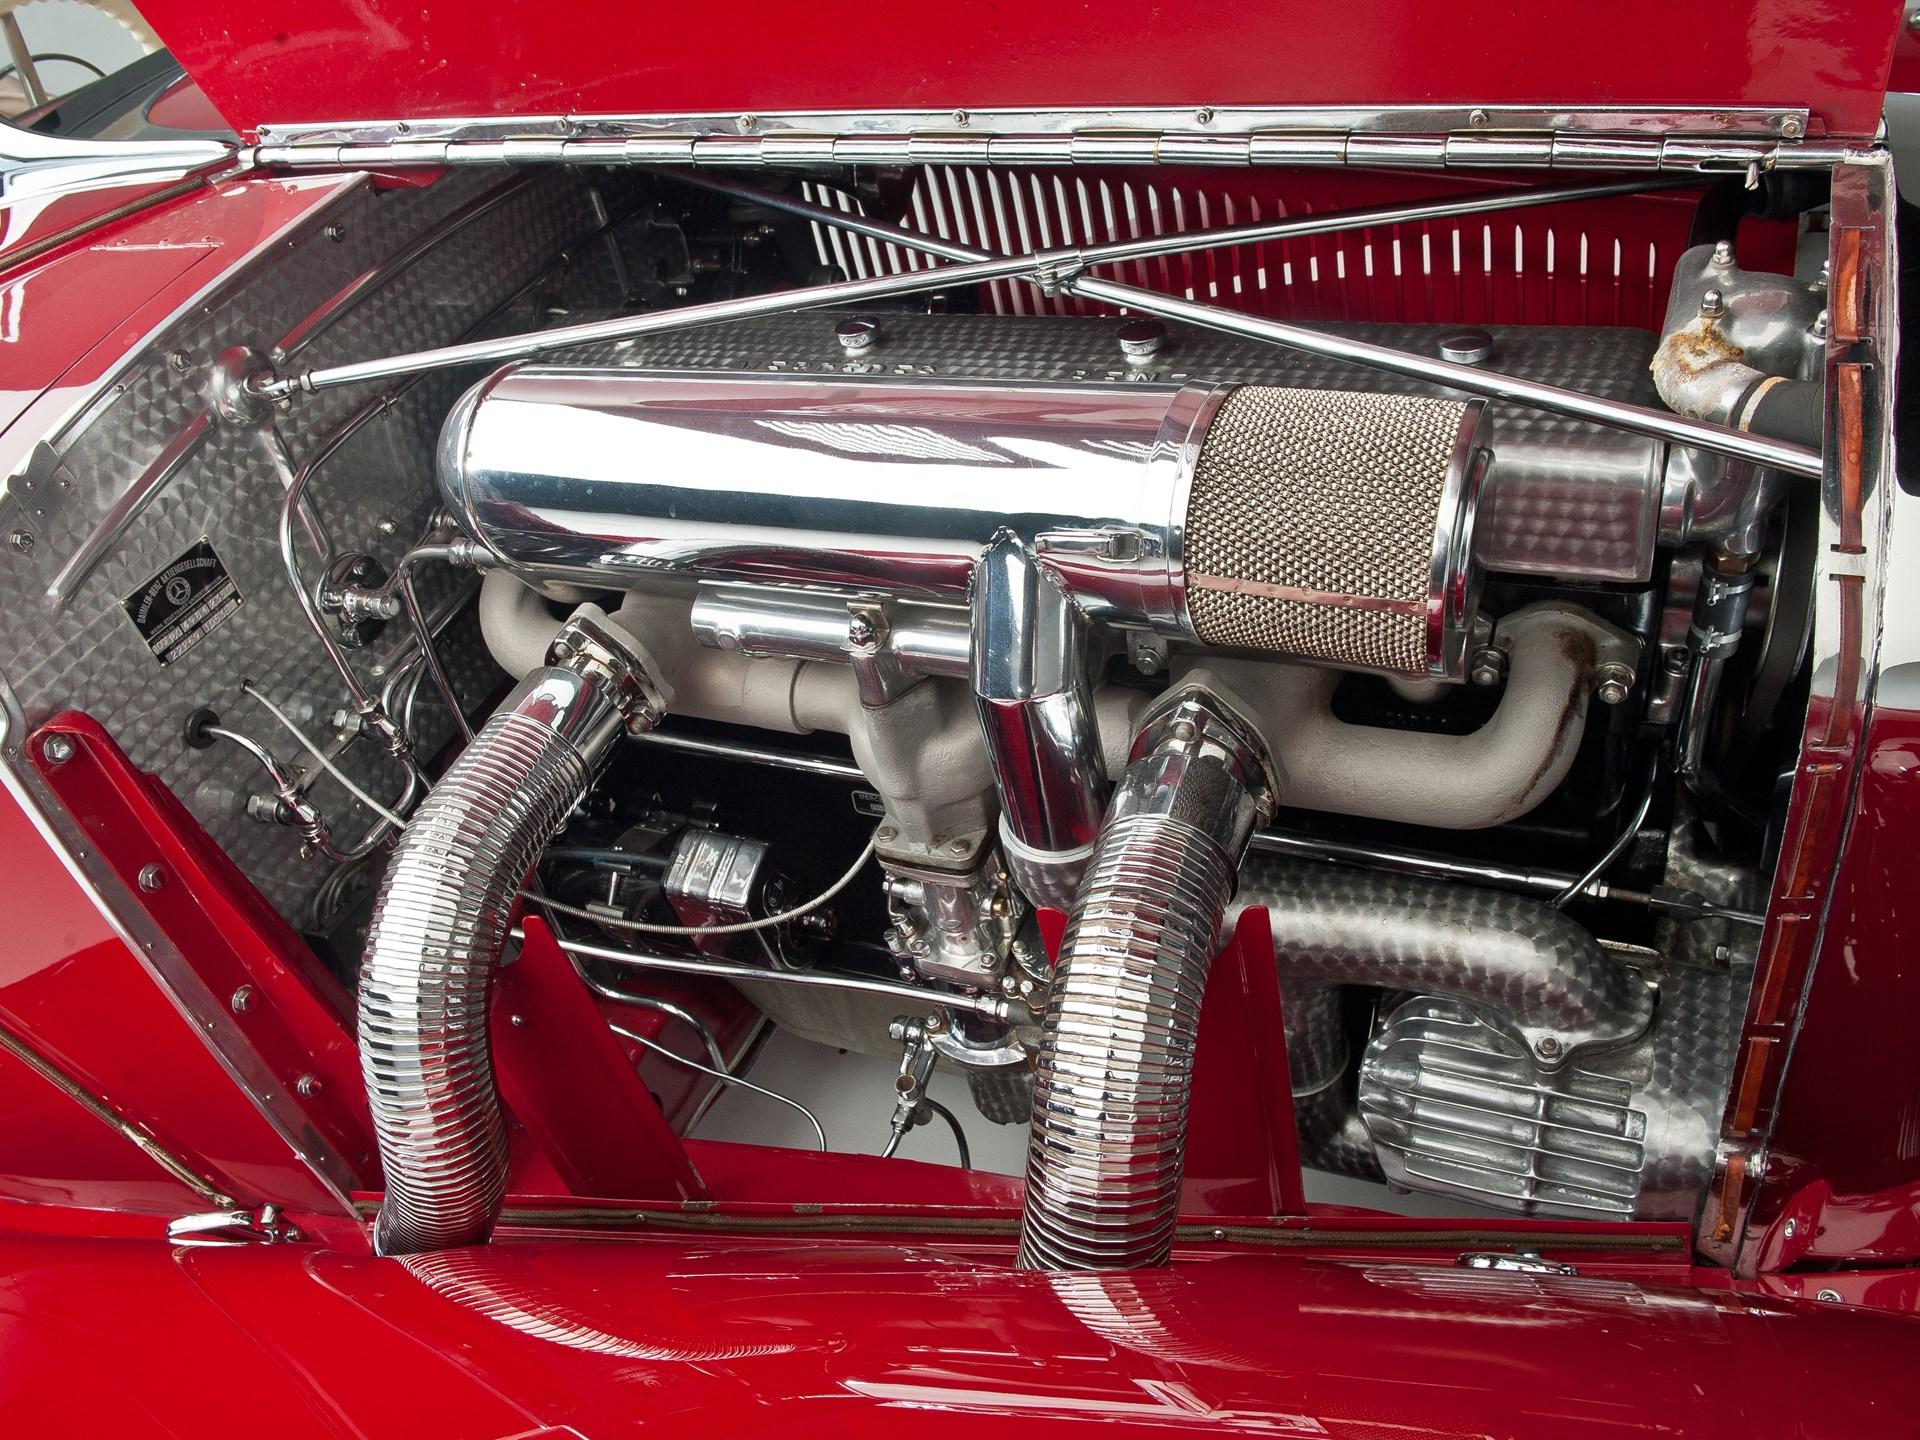 1935 Mercedes-Benz 500k supercharger engine